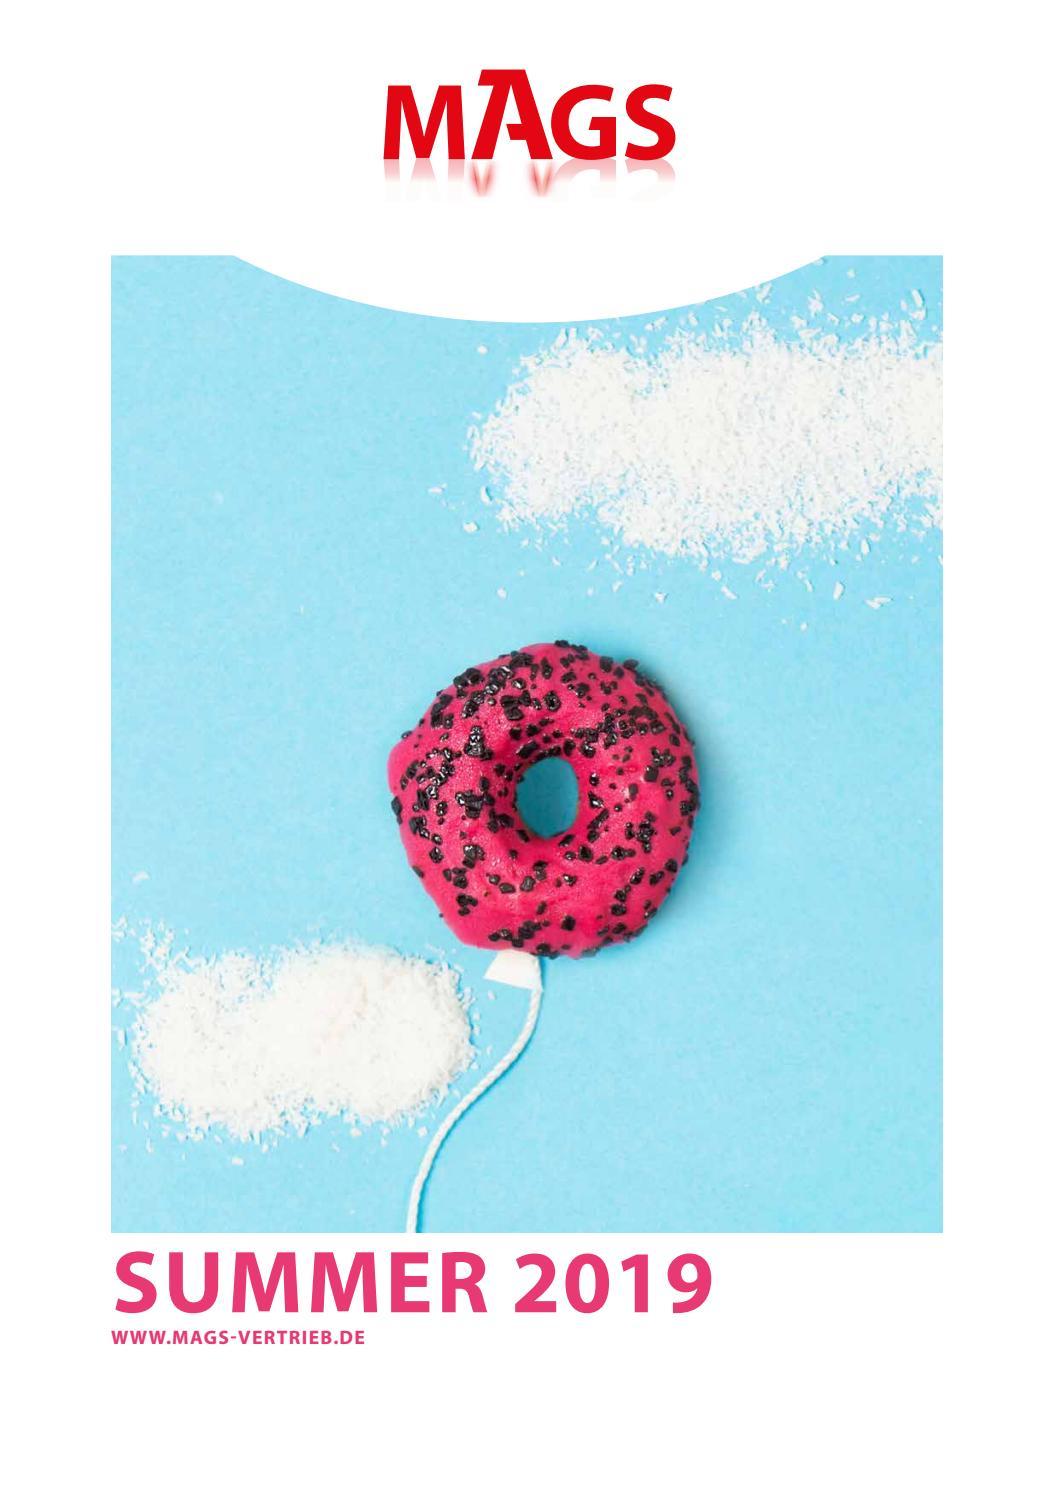 Mags Summer Catalogue 2019 By Mags Vertrieb - Issuu serapportantà Nain De Jardin Fuck